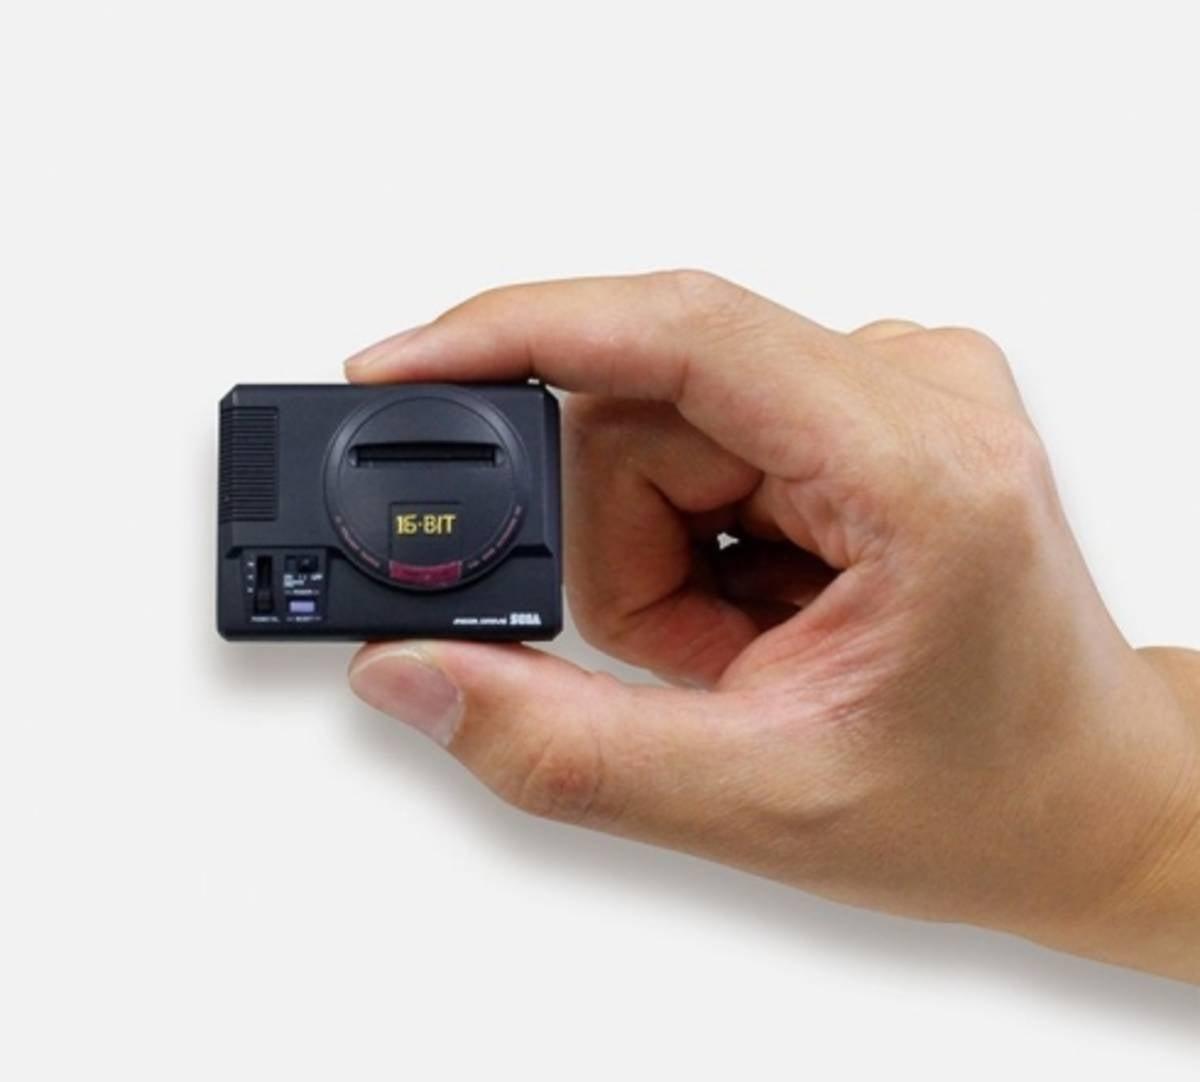 The Sega Genesis Turned Tiny For Capsule Toys